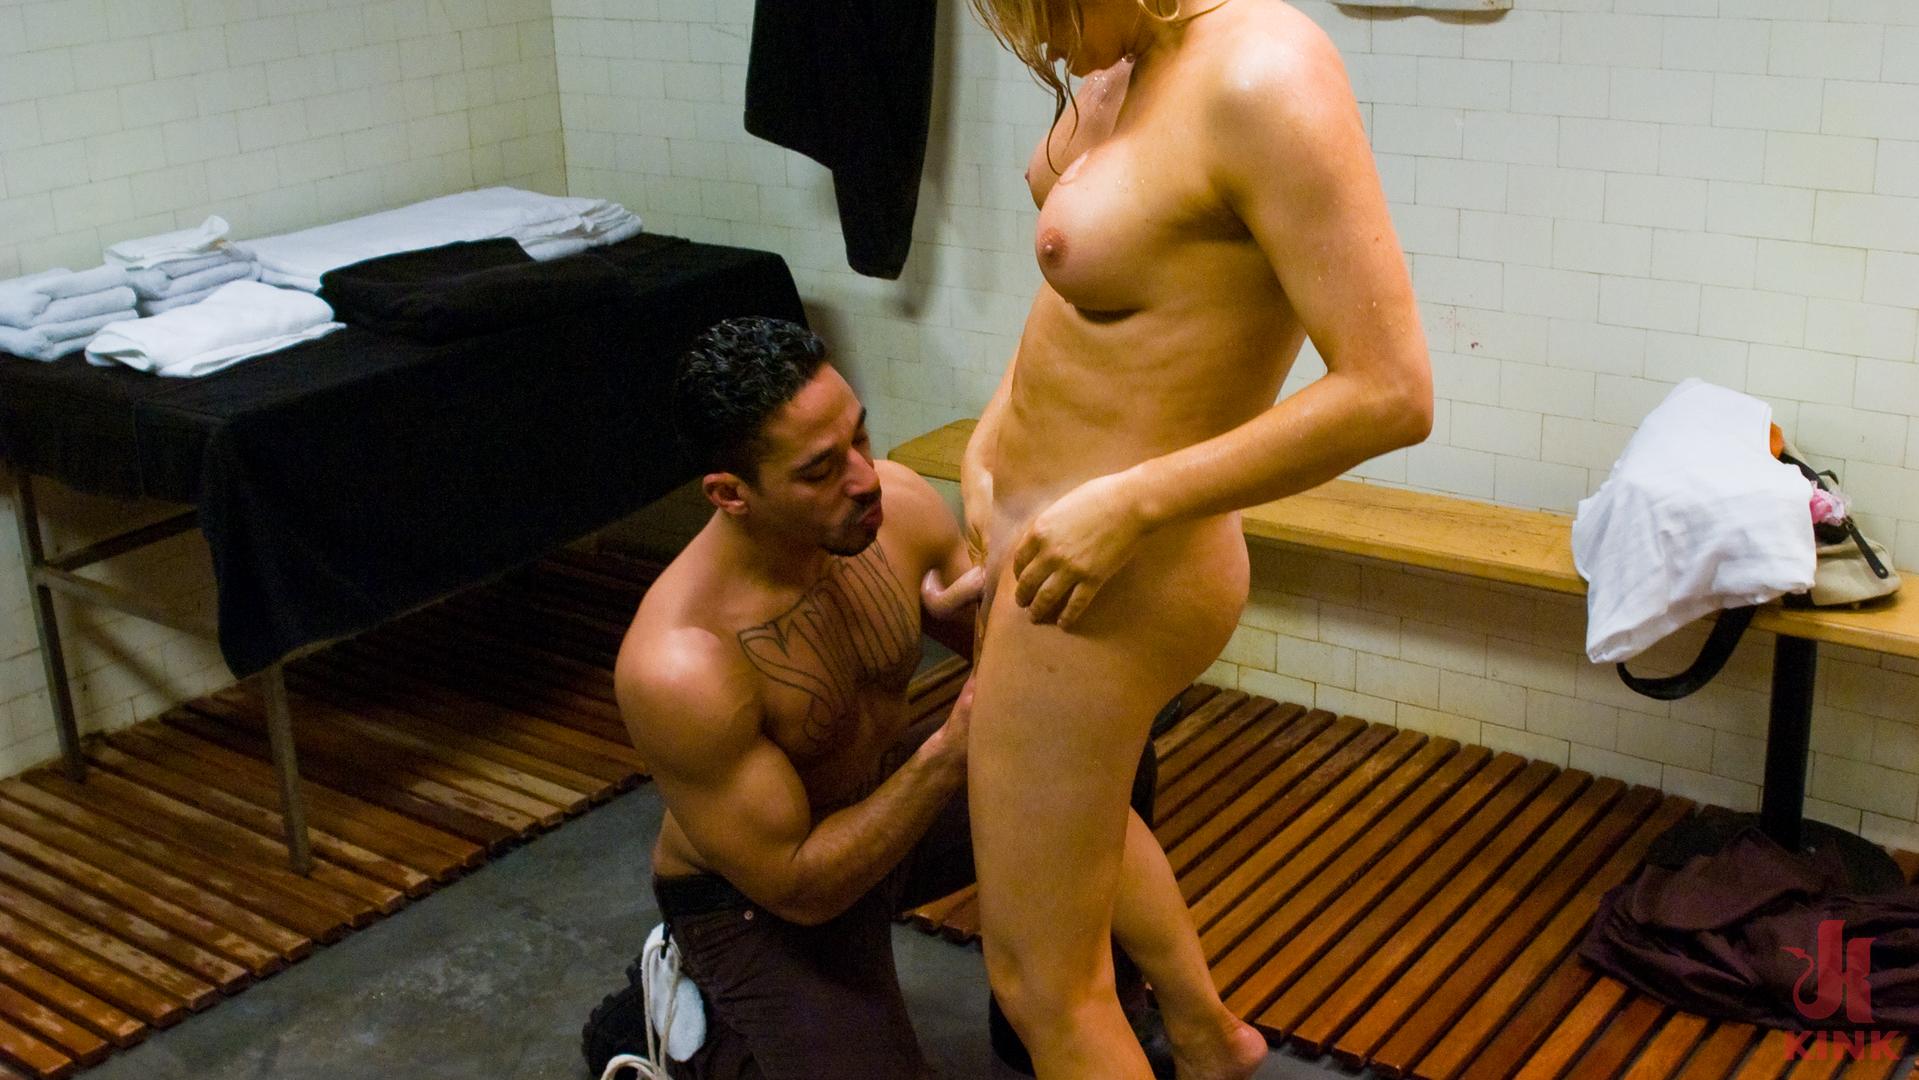 Photo number 3 from Carmen Cruz: Seduction in the Shower shot for TS Seduction on Kink.com. Featuring Carmen Cruz and Lobo in hardcore BDSM & Fetish porn.